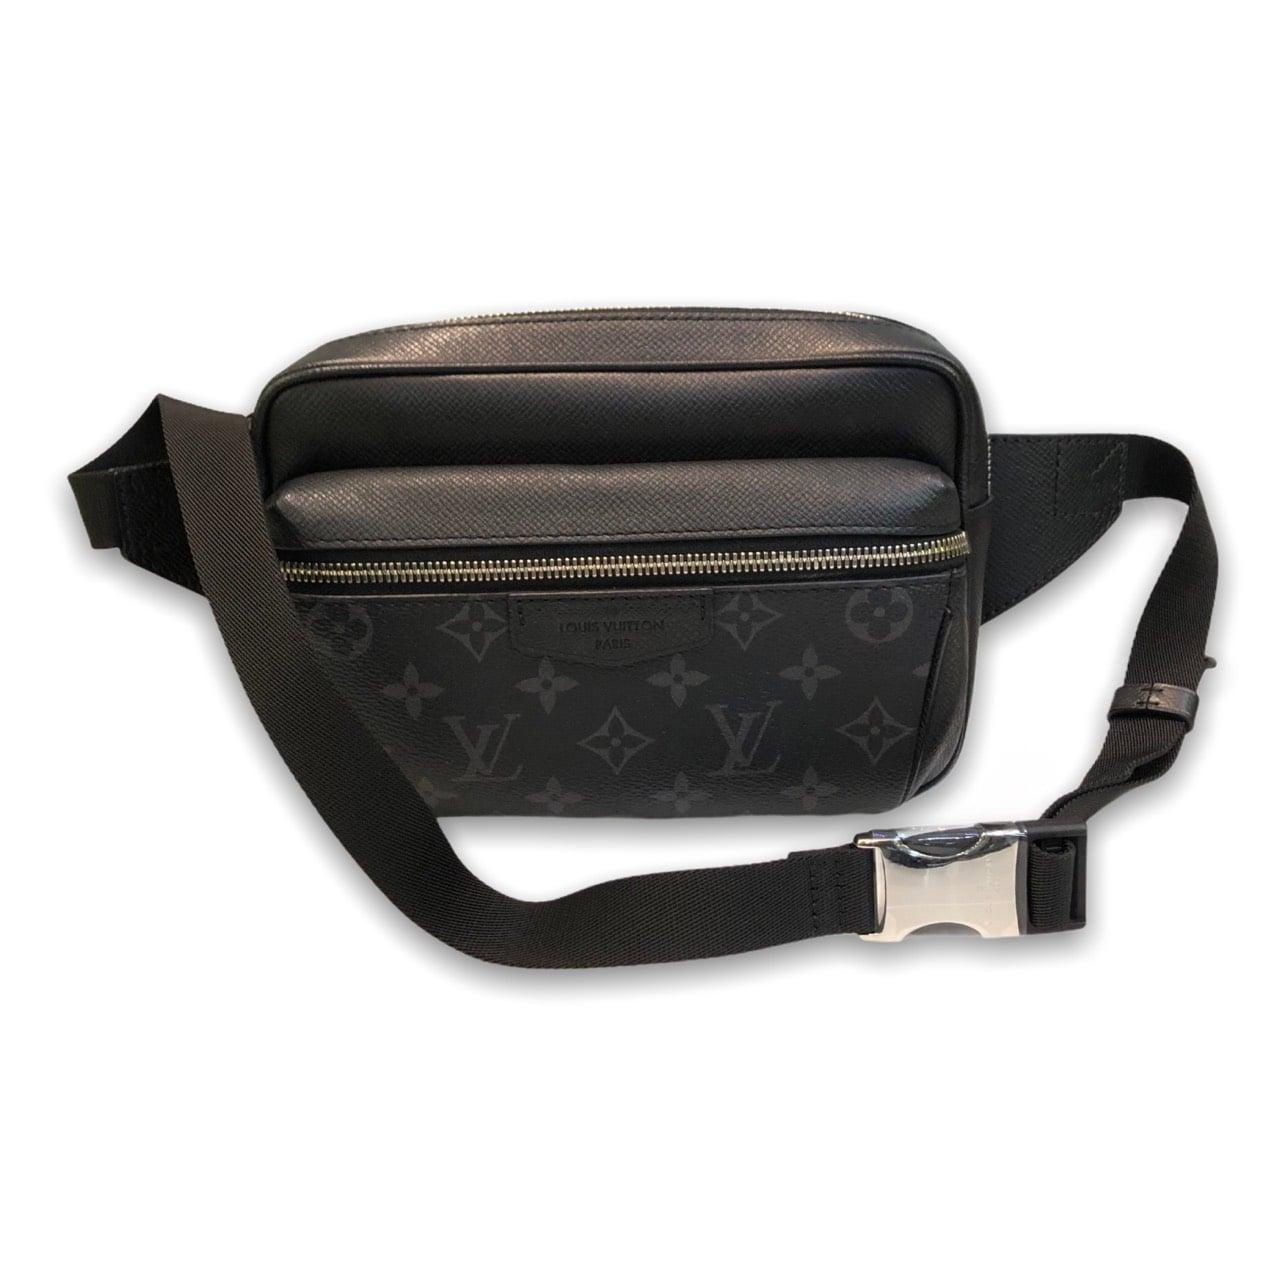 "Louis Belt bag Out door Monogram Eclipse noir Dc 19"""